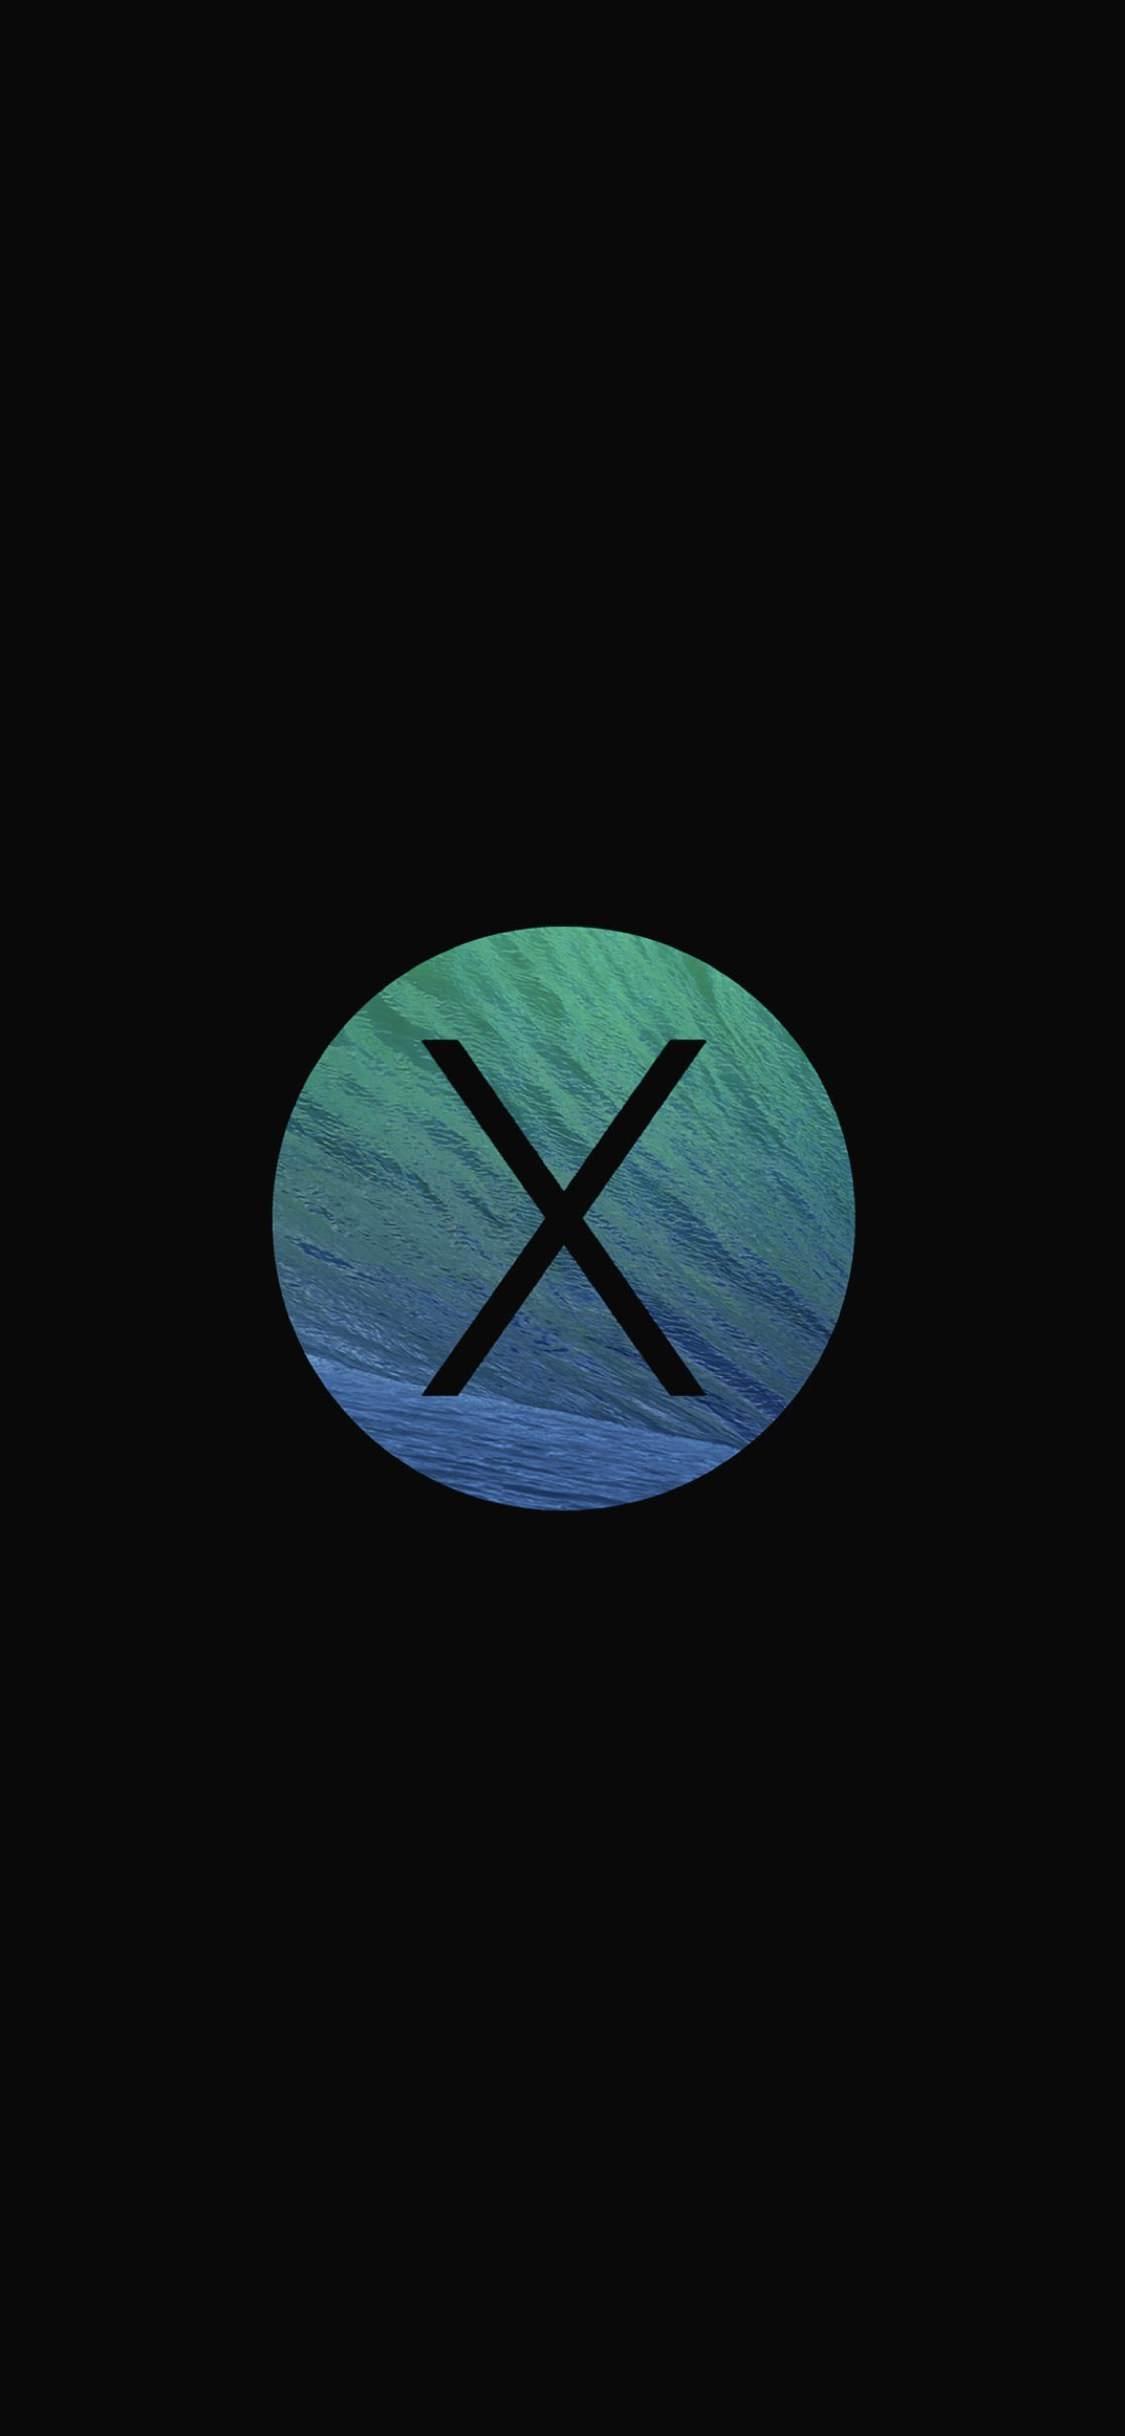 iPhone XS , iPhone X 壁紙 1026